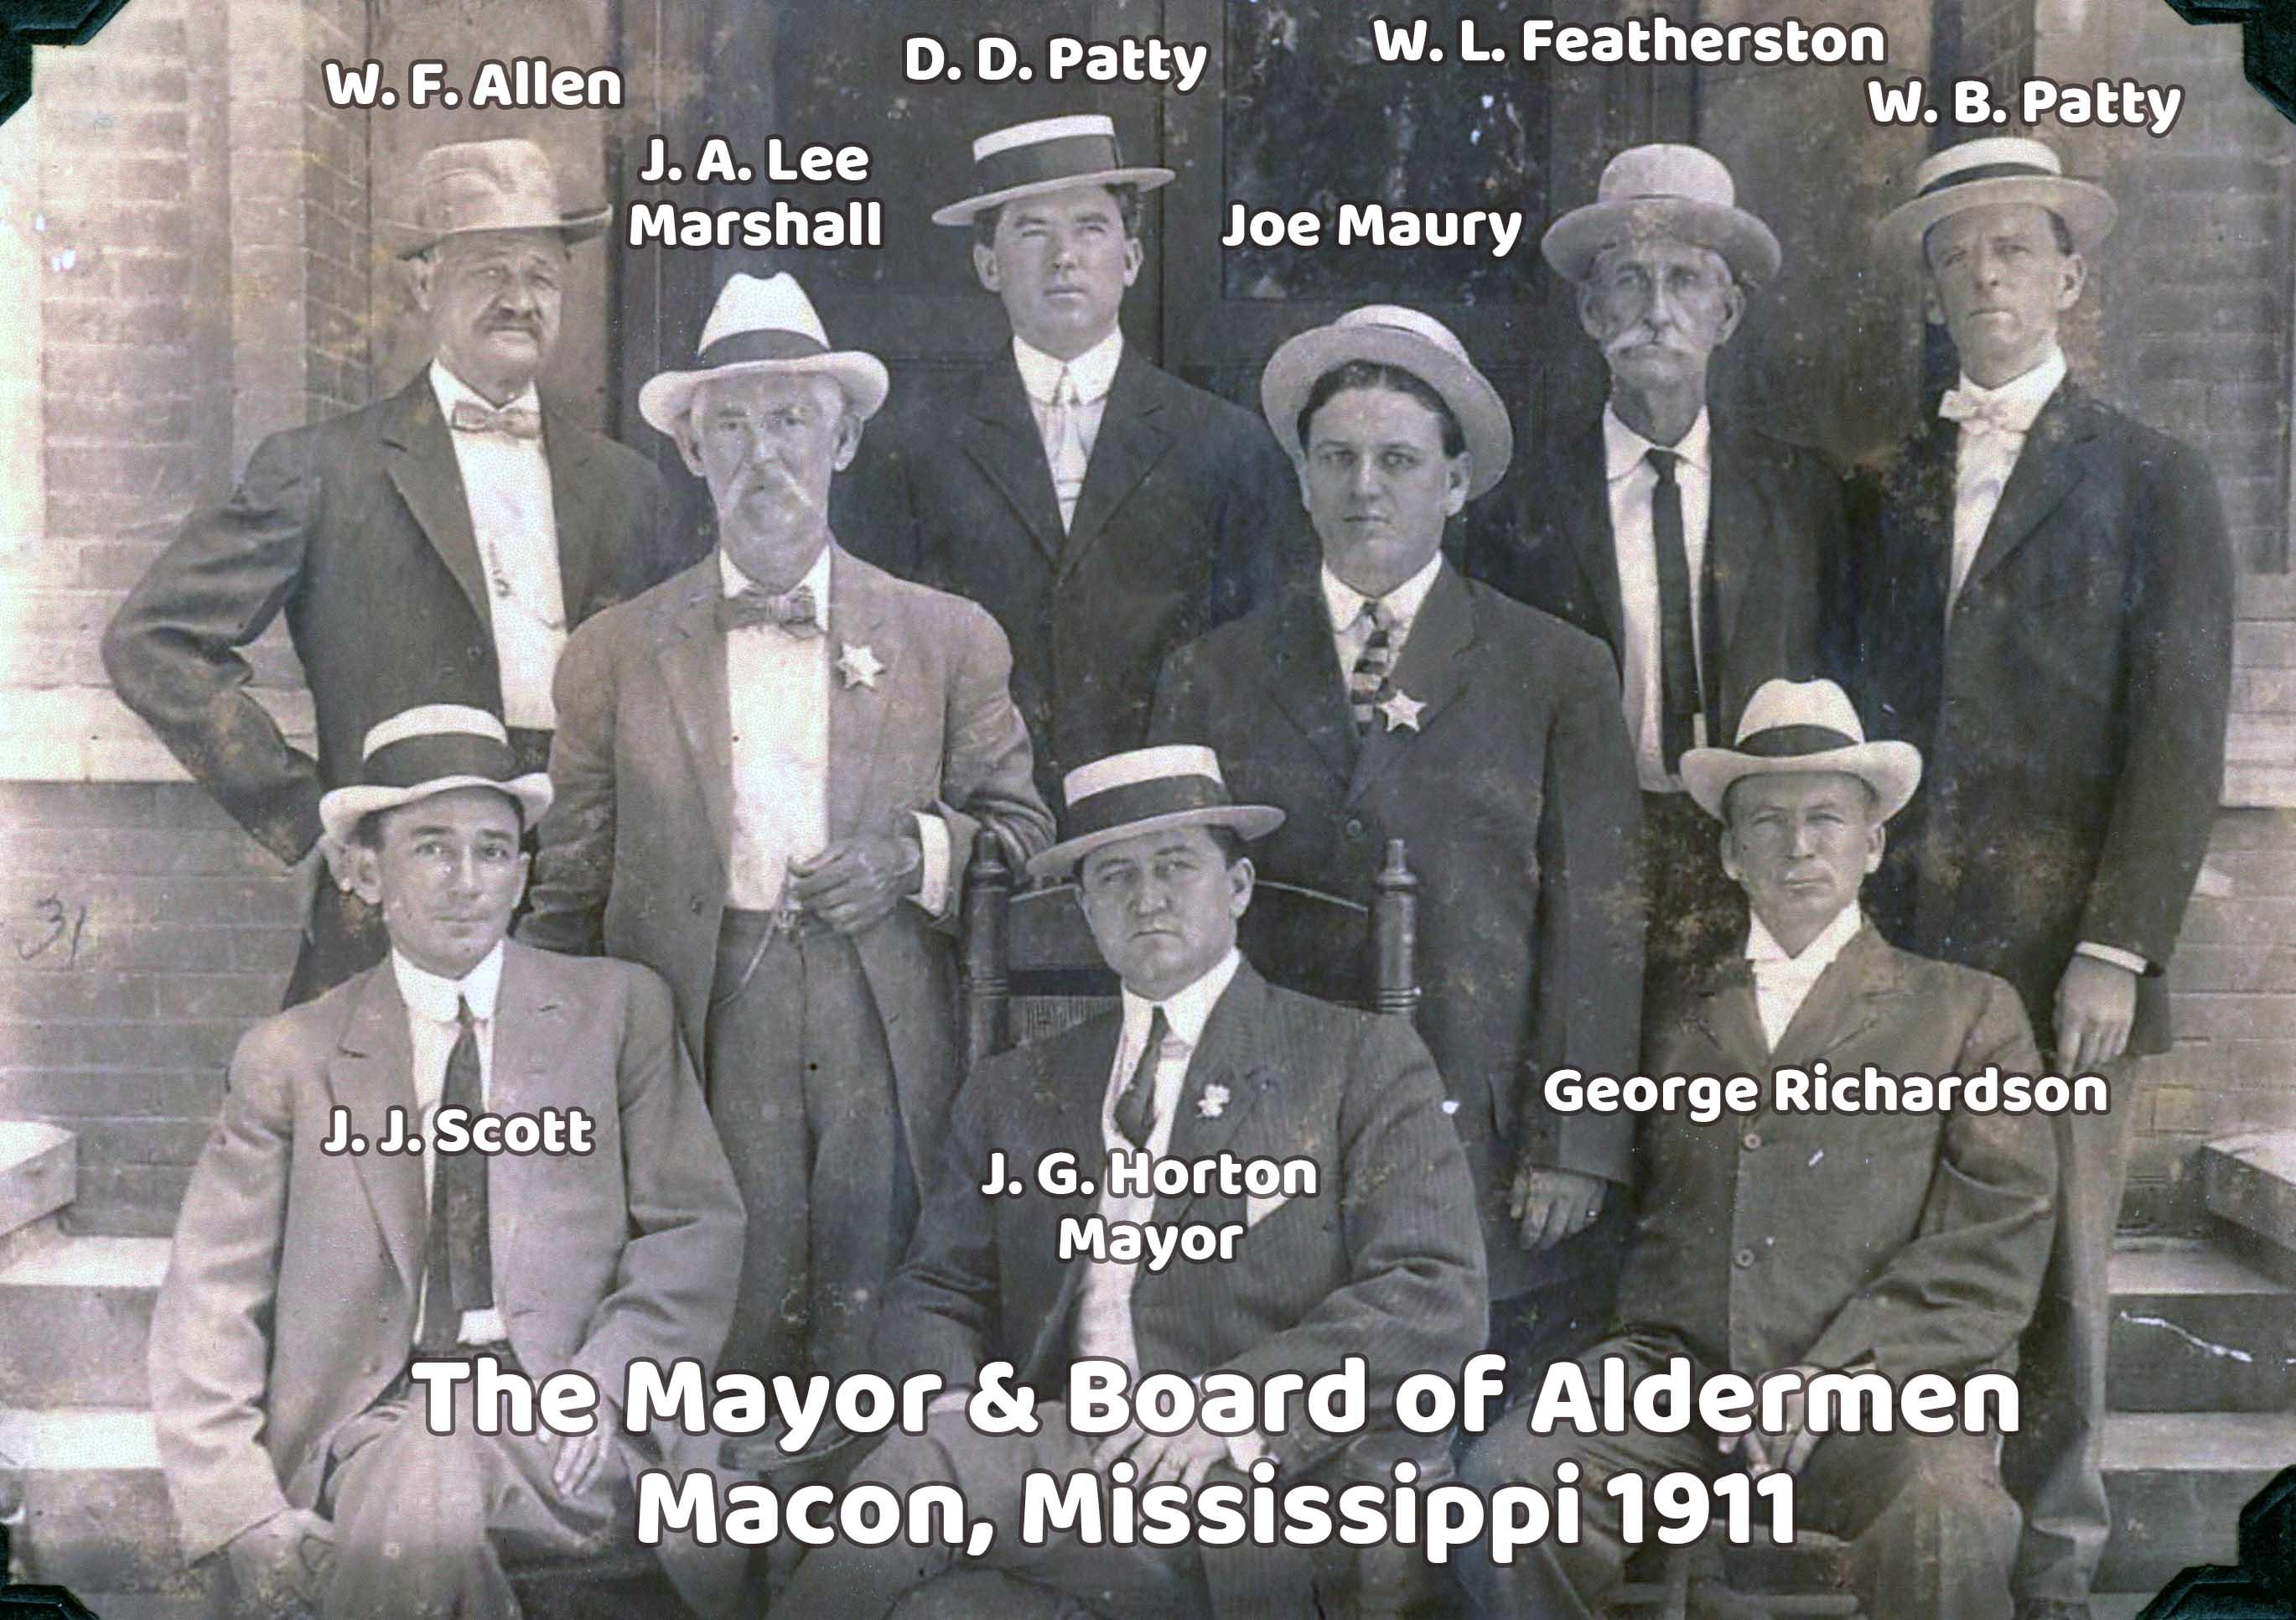 Macon, Mississippi 1911 Mayor and Board of Aldermen